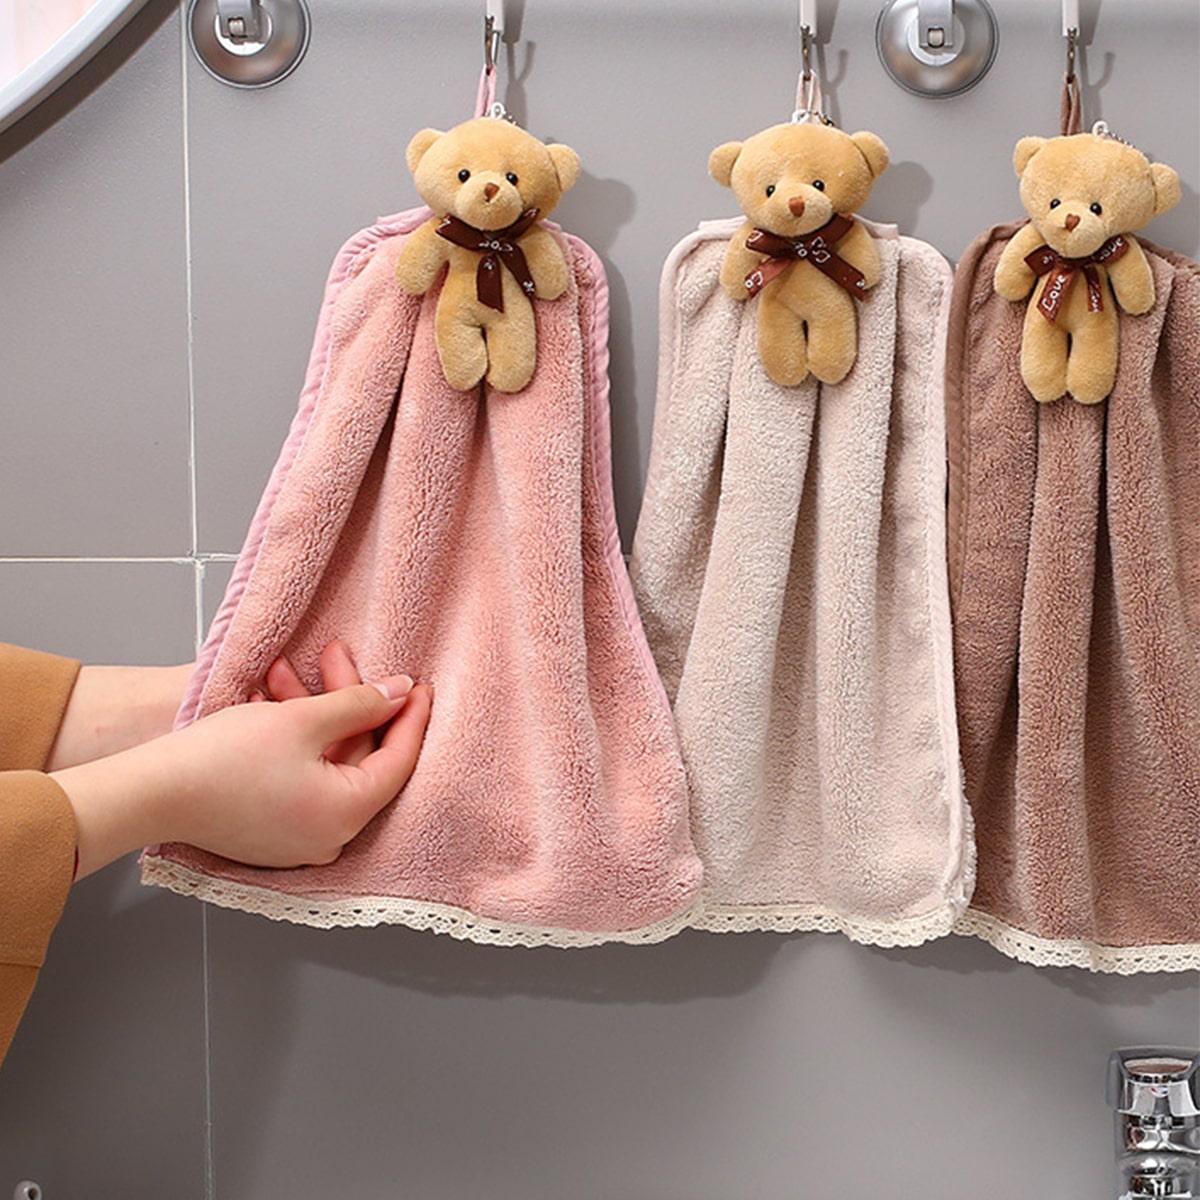 1Pc Bear Decor Random Color Hand Towel